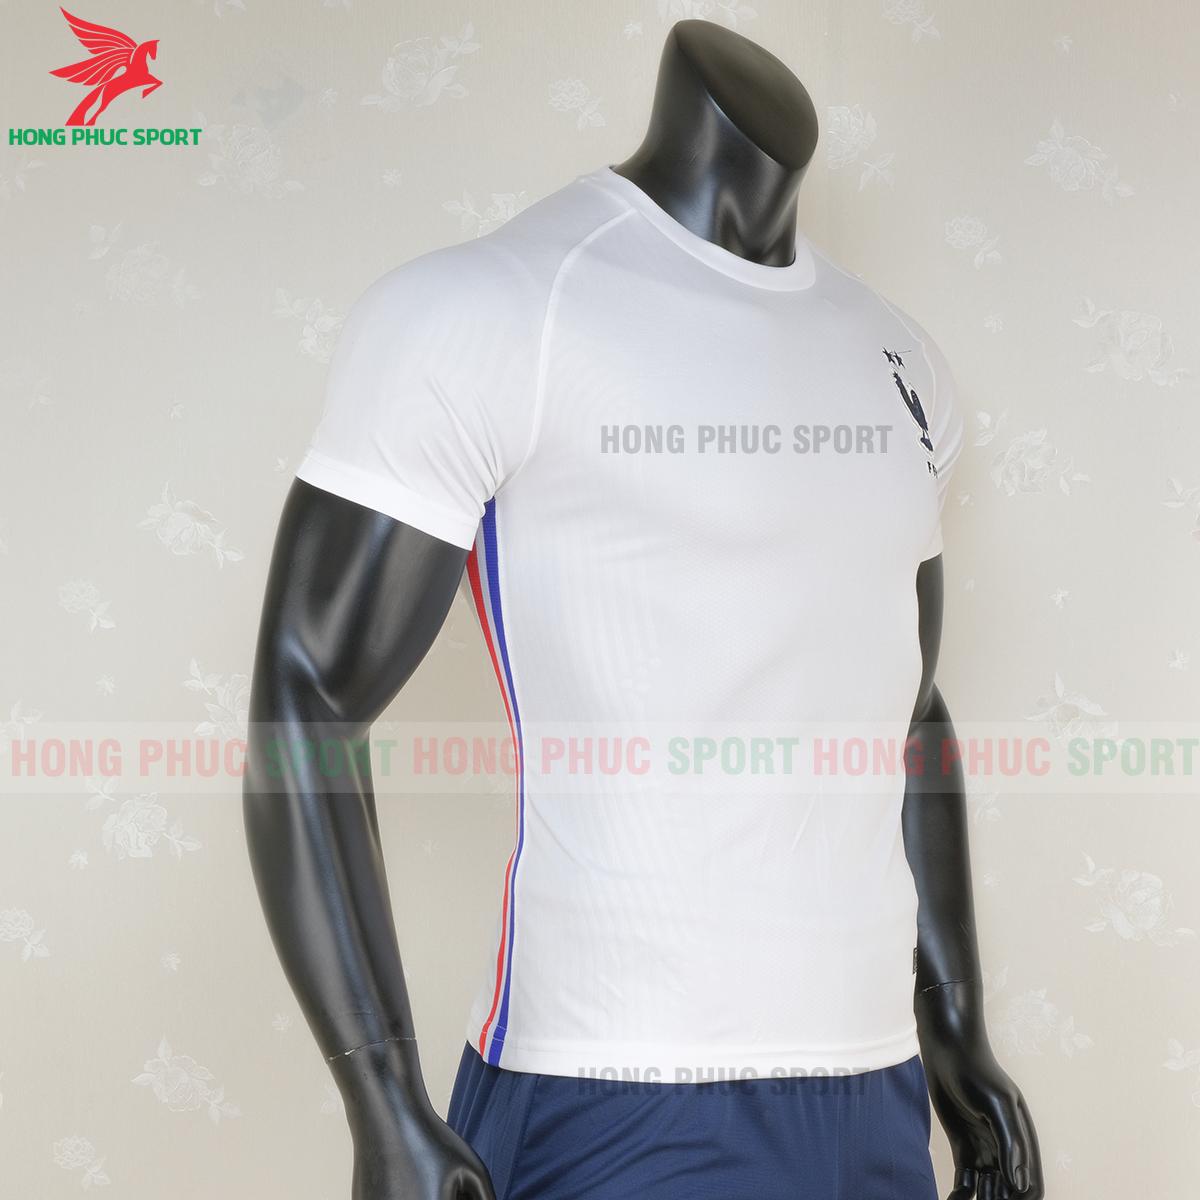 https://cdn.hongphucsport.com/unsafe/s4.shopbay.vn/files/285/ao-bong-da-tuyen-phap-san-khach-2020-2-5f6e9e6186f4a.png